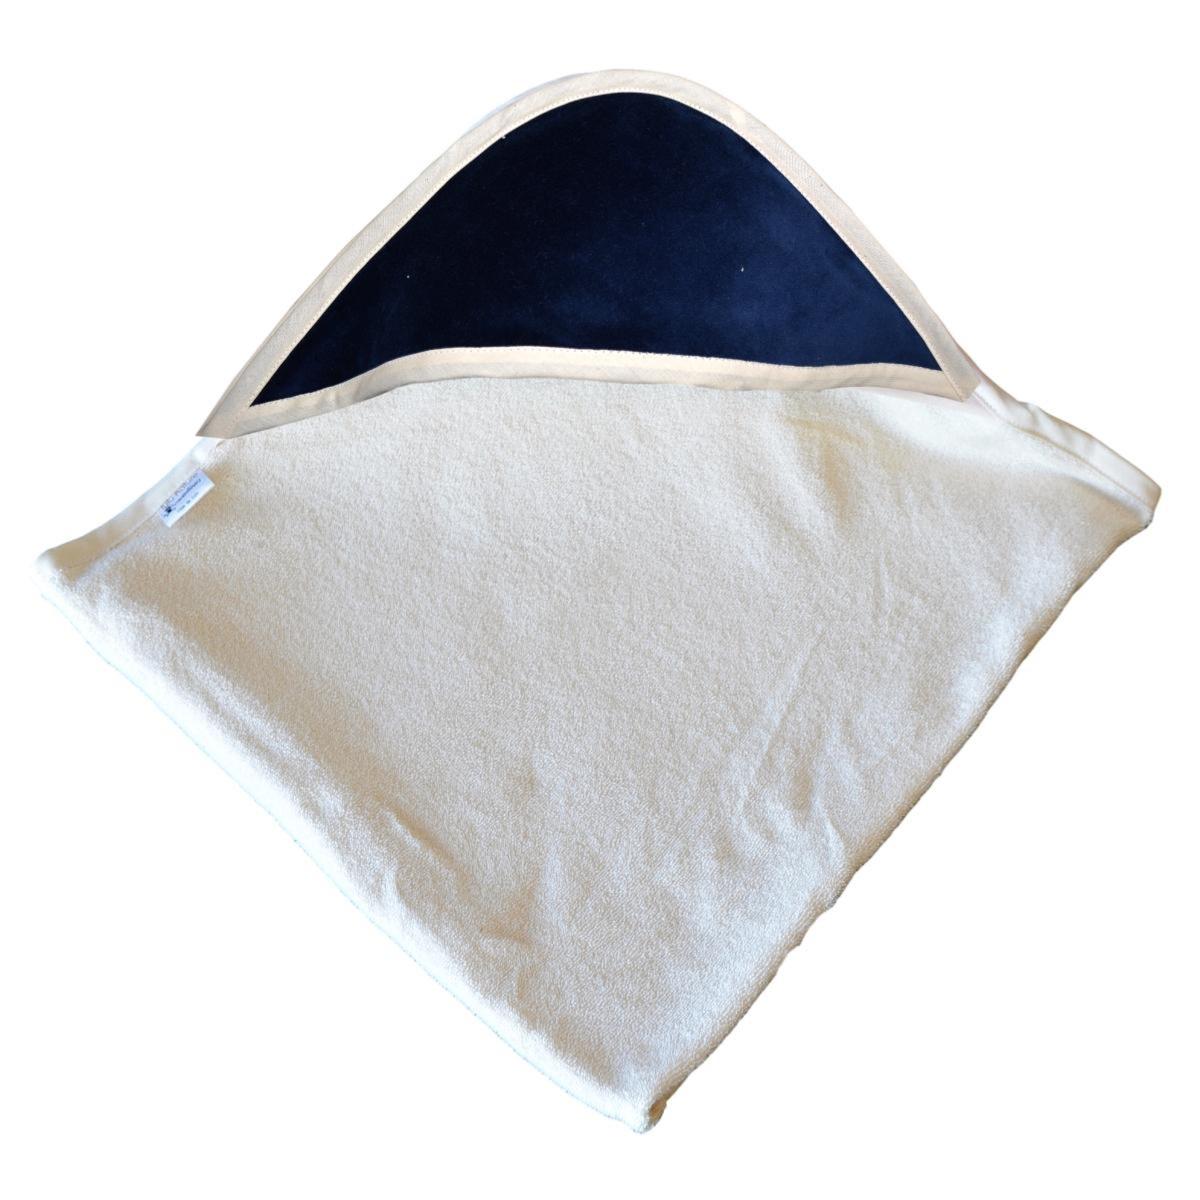 cape de bain bambou capuche marine. Black Bedroom Furniture Sets. Home Design Ideas